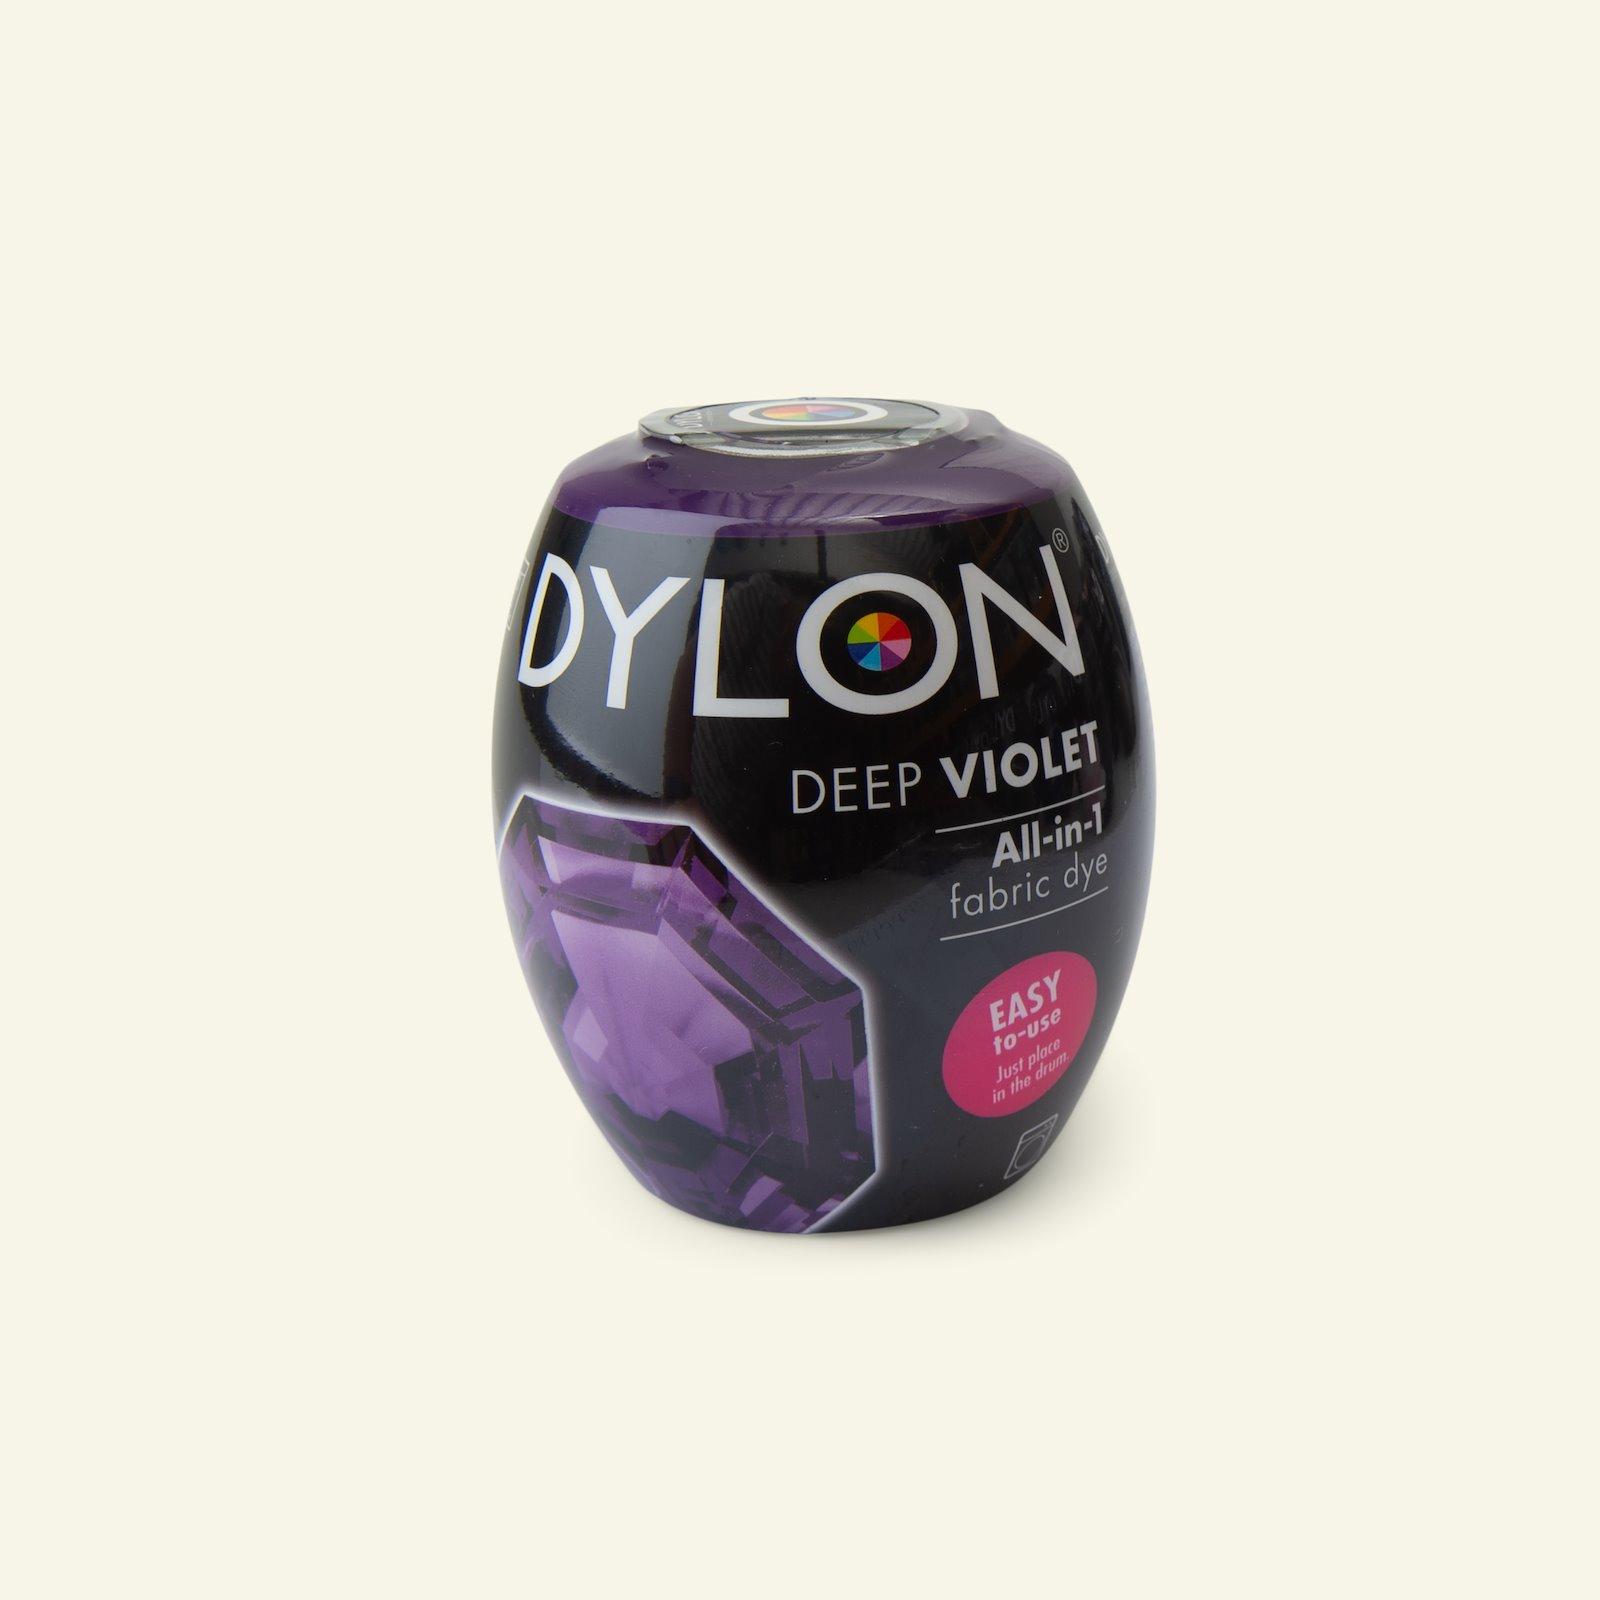 Dylon fabric dye for machine purple 29708_pack_b